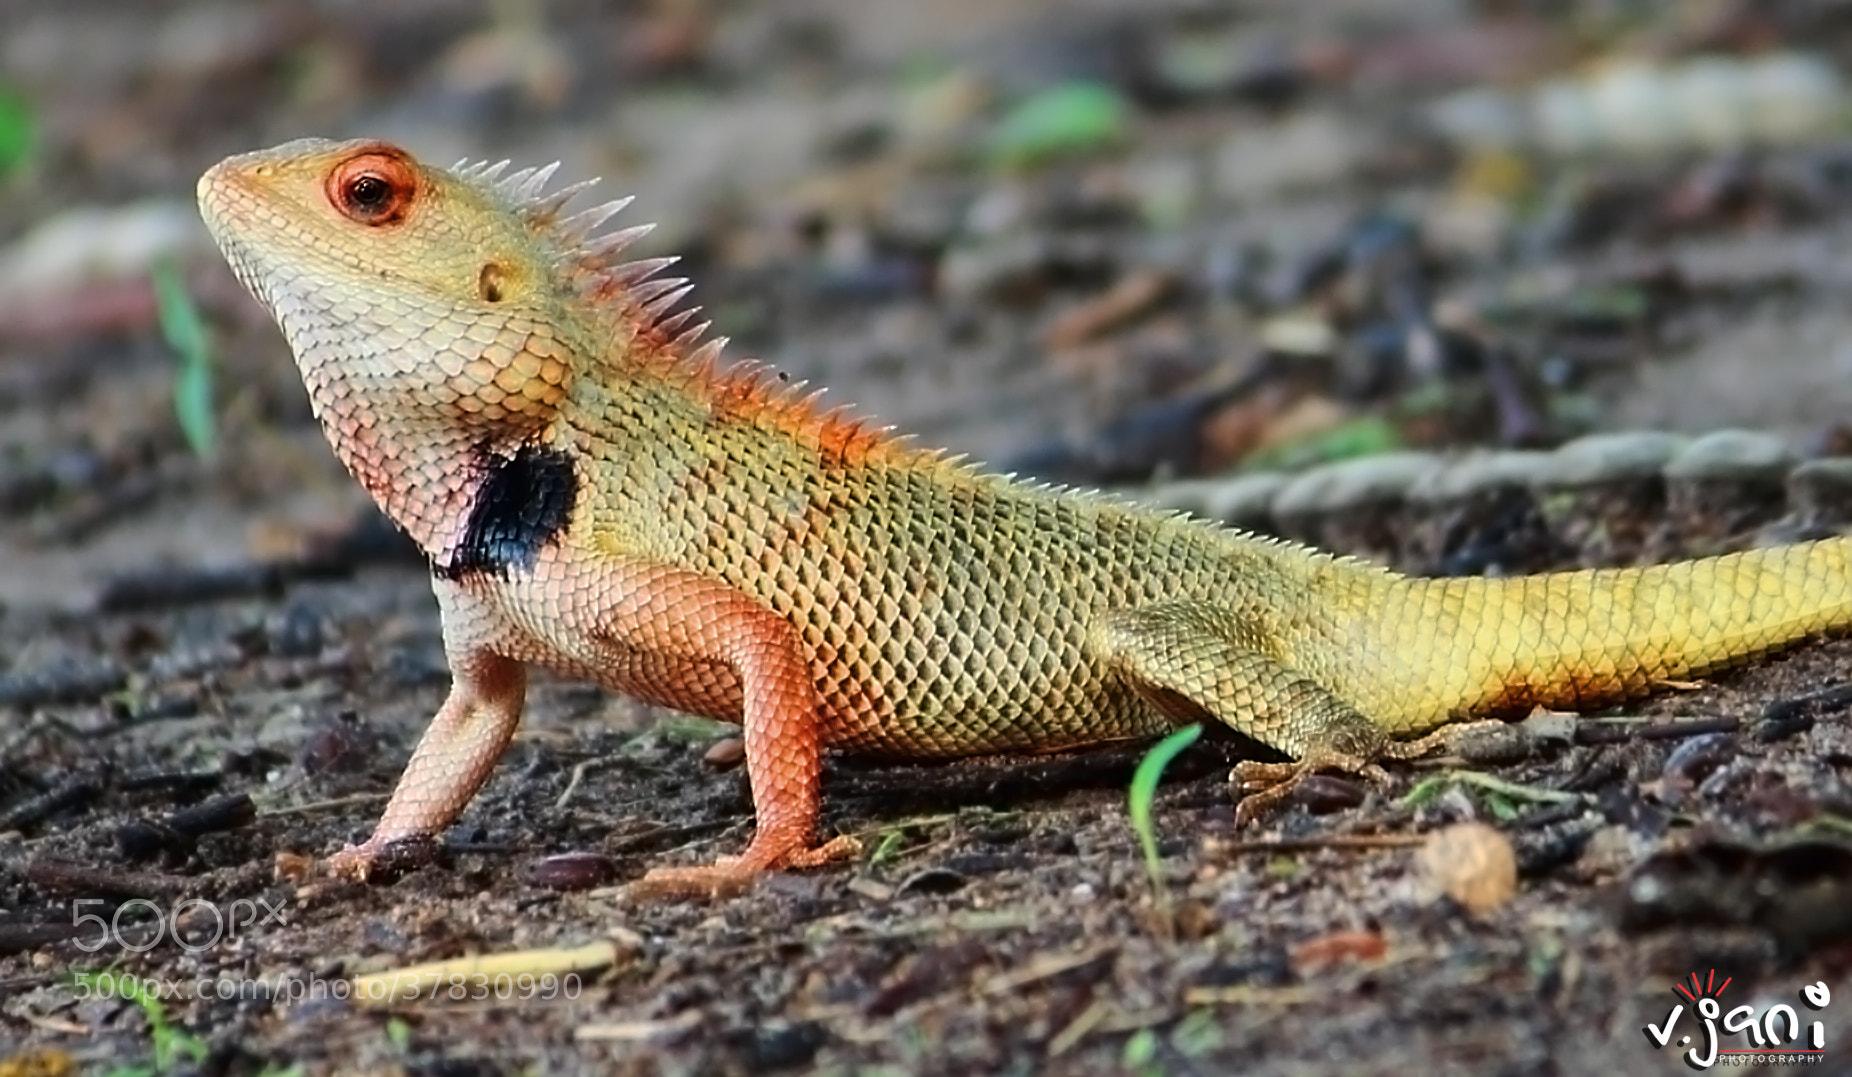 Photograph Chameleon by vishal jani on 500px